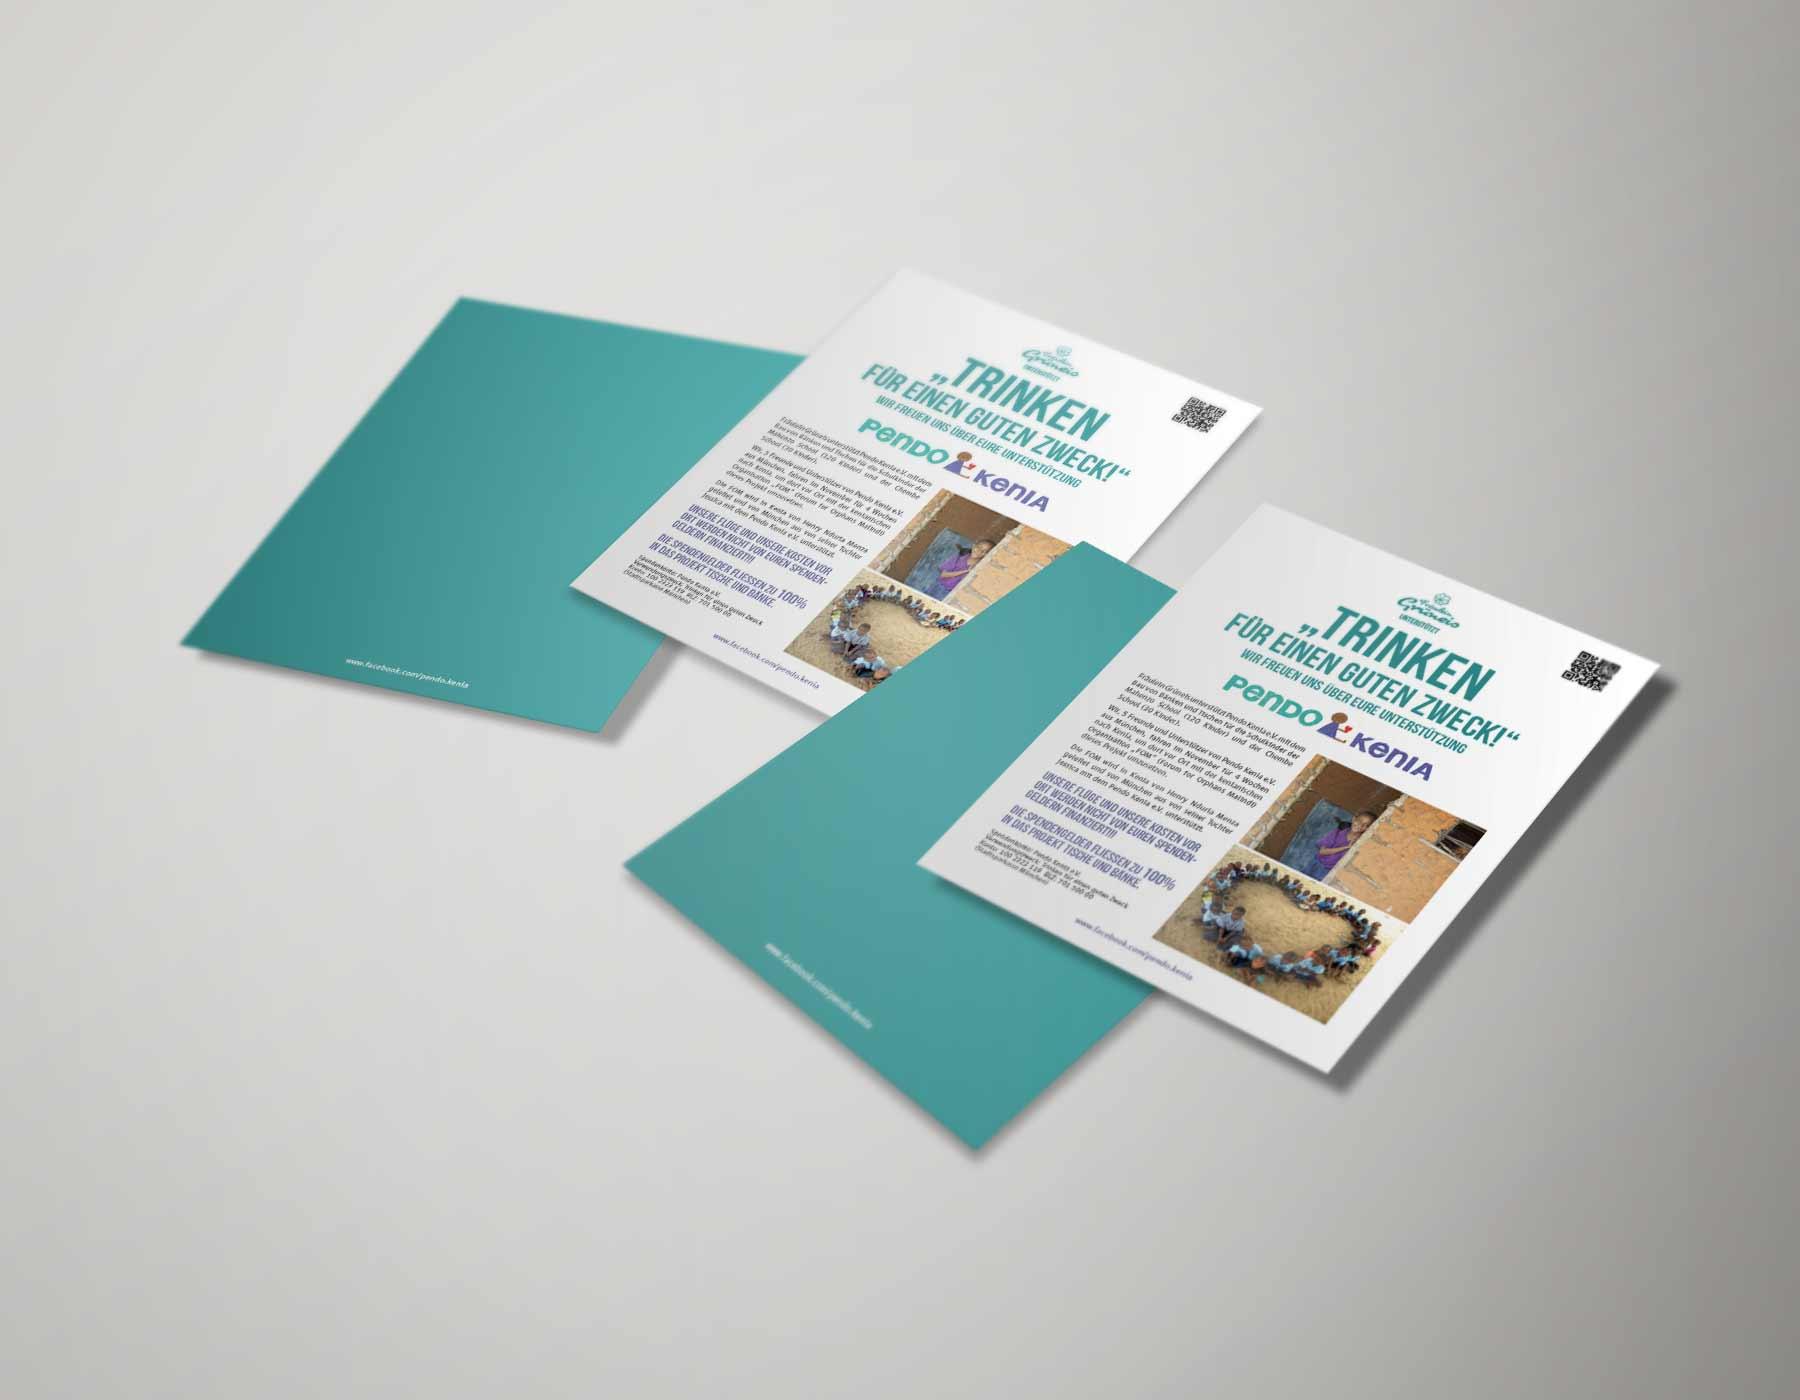 PendoKenia-mockup-flyer02